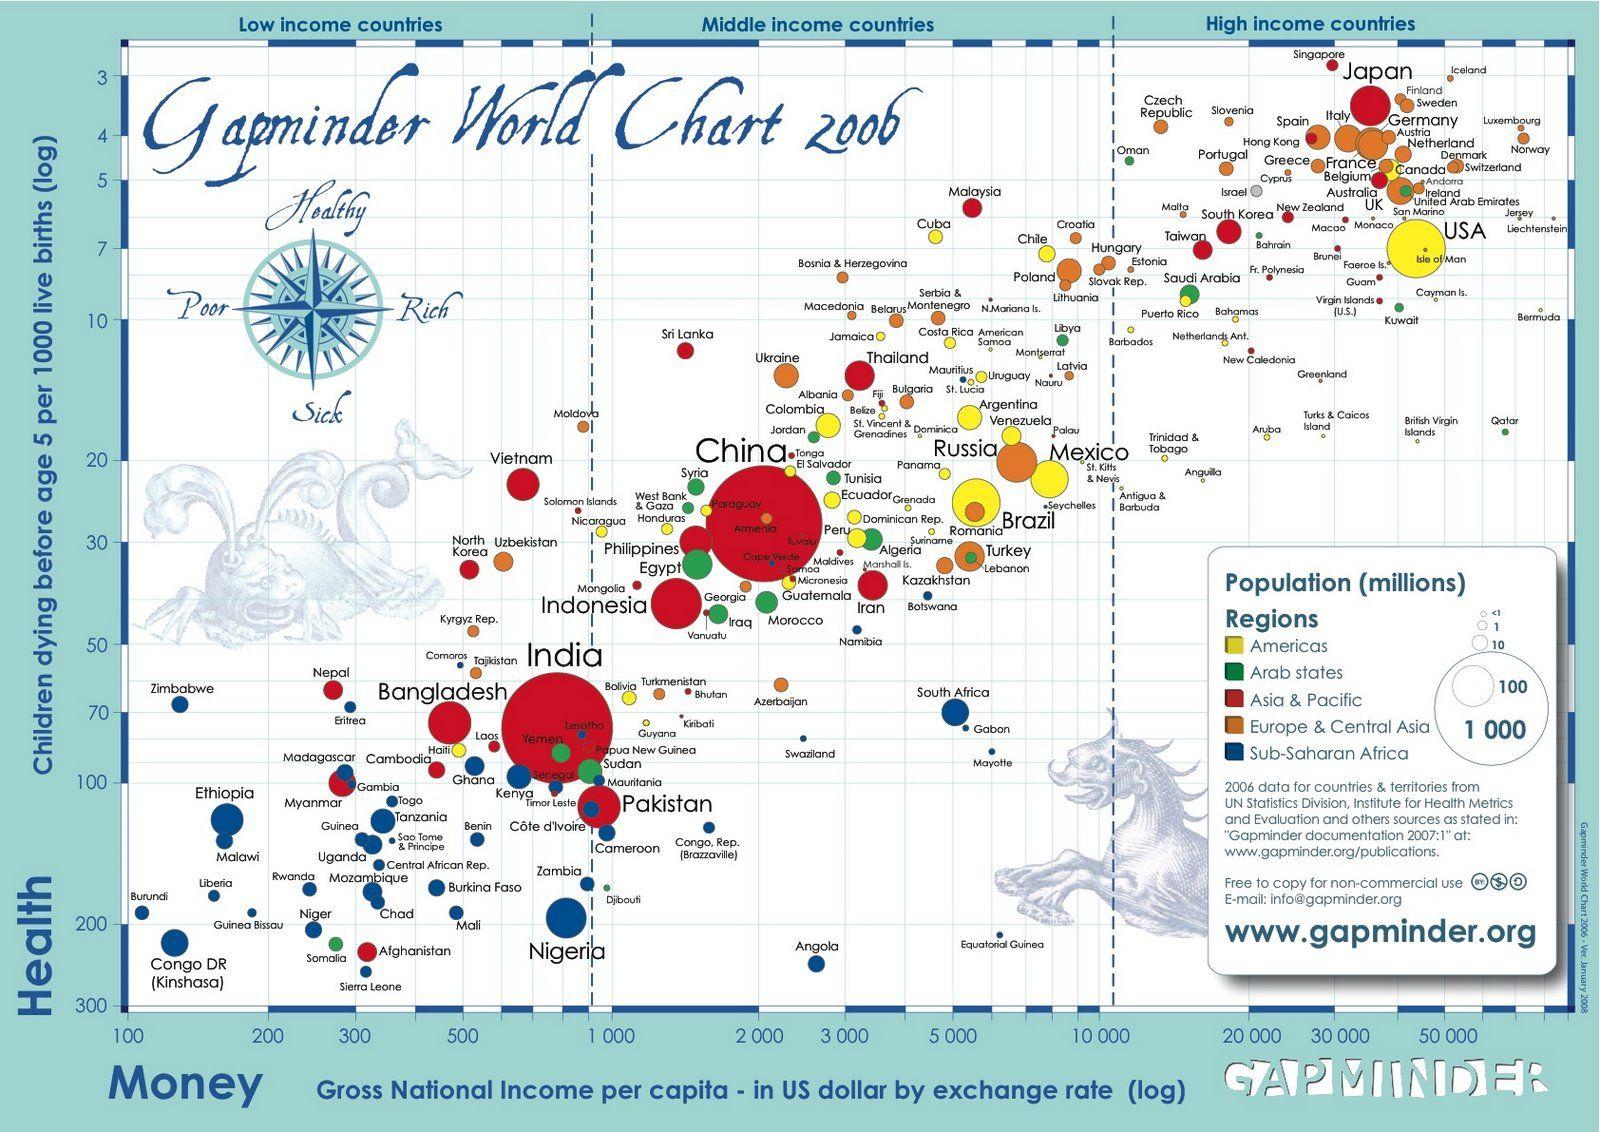 [gapminder_world_chart_2006.jpg]